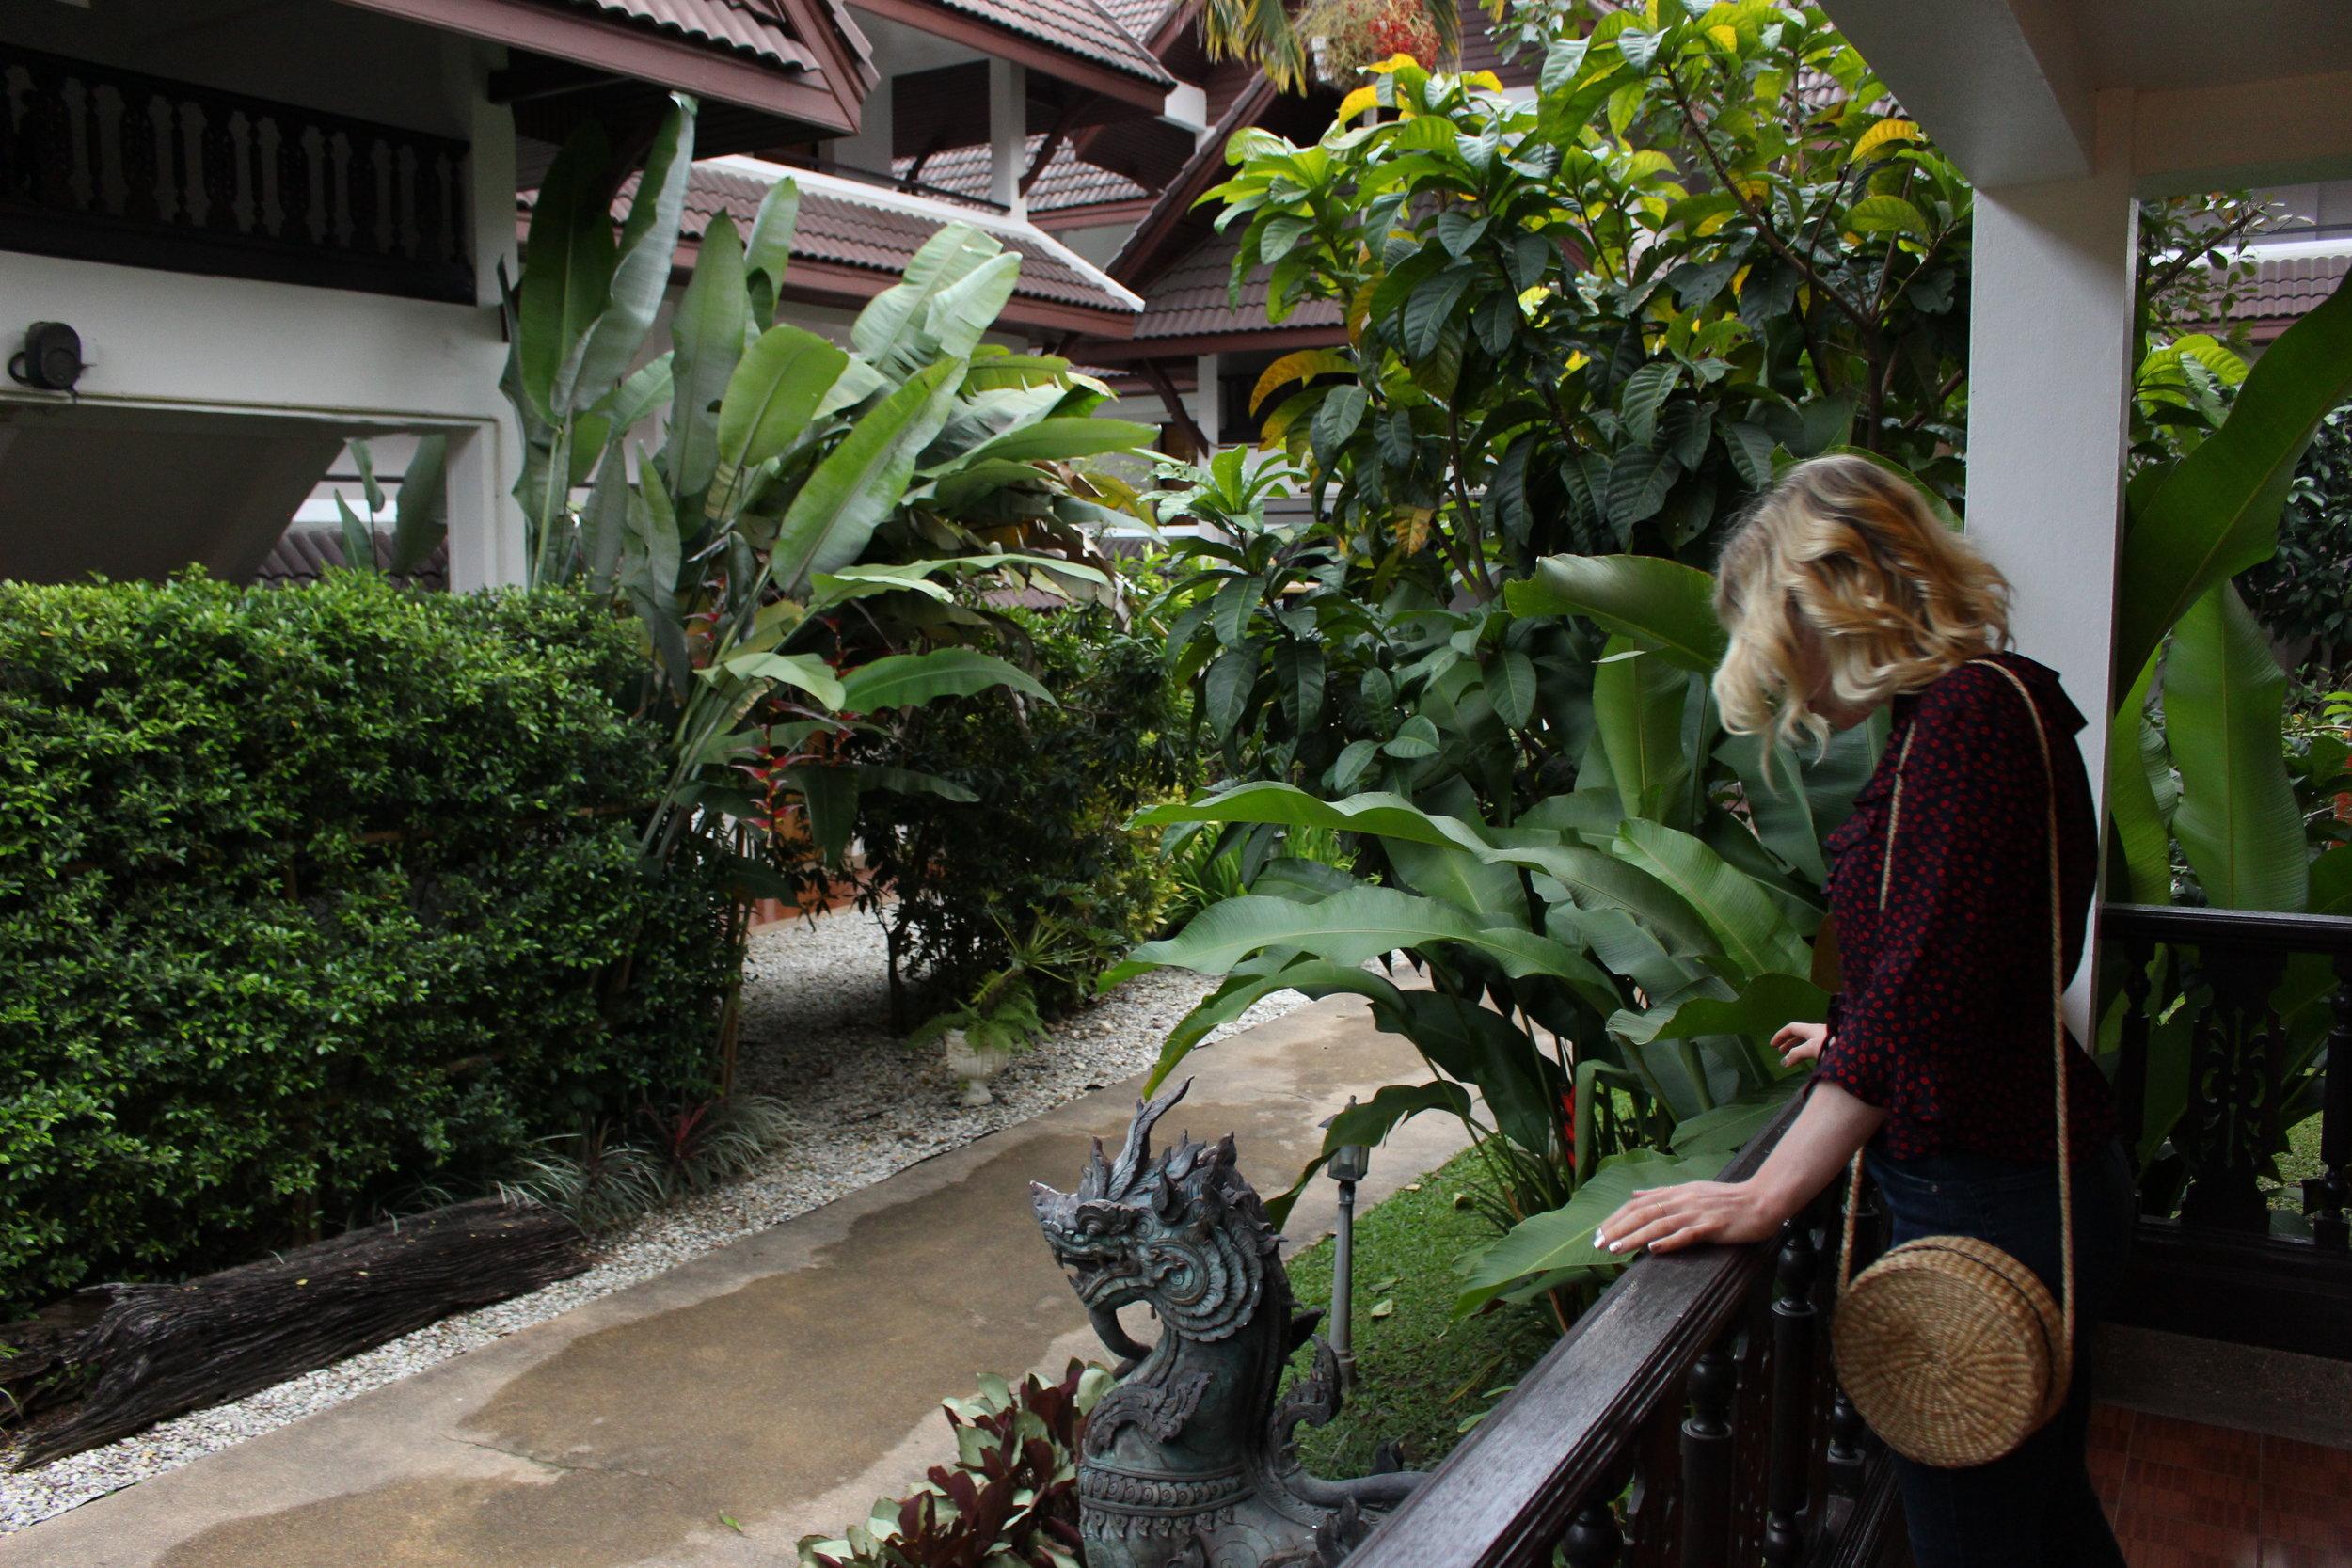 Our beautiful hotel Nak Nakara